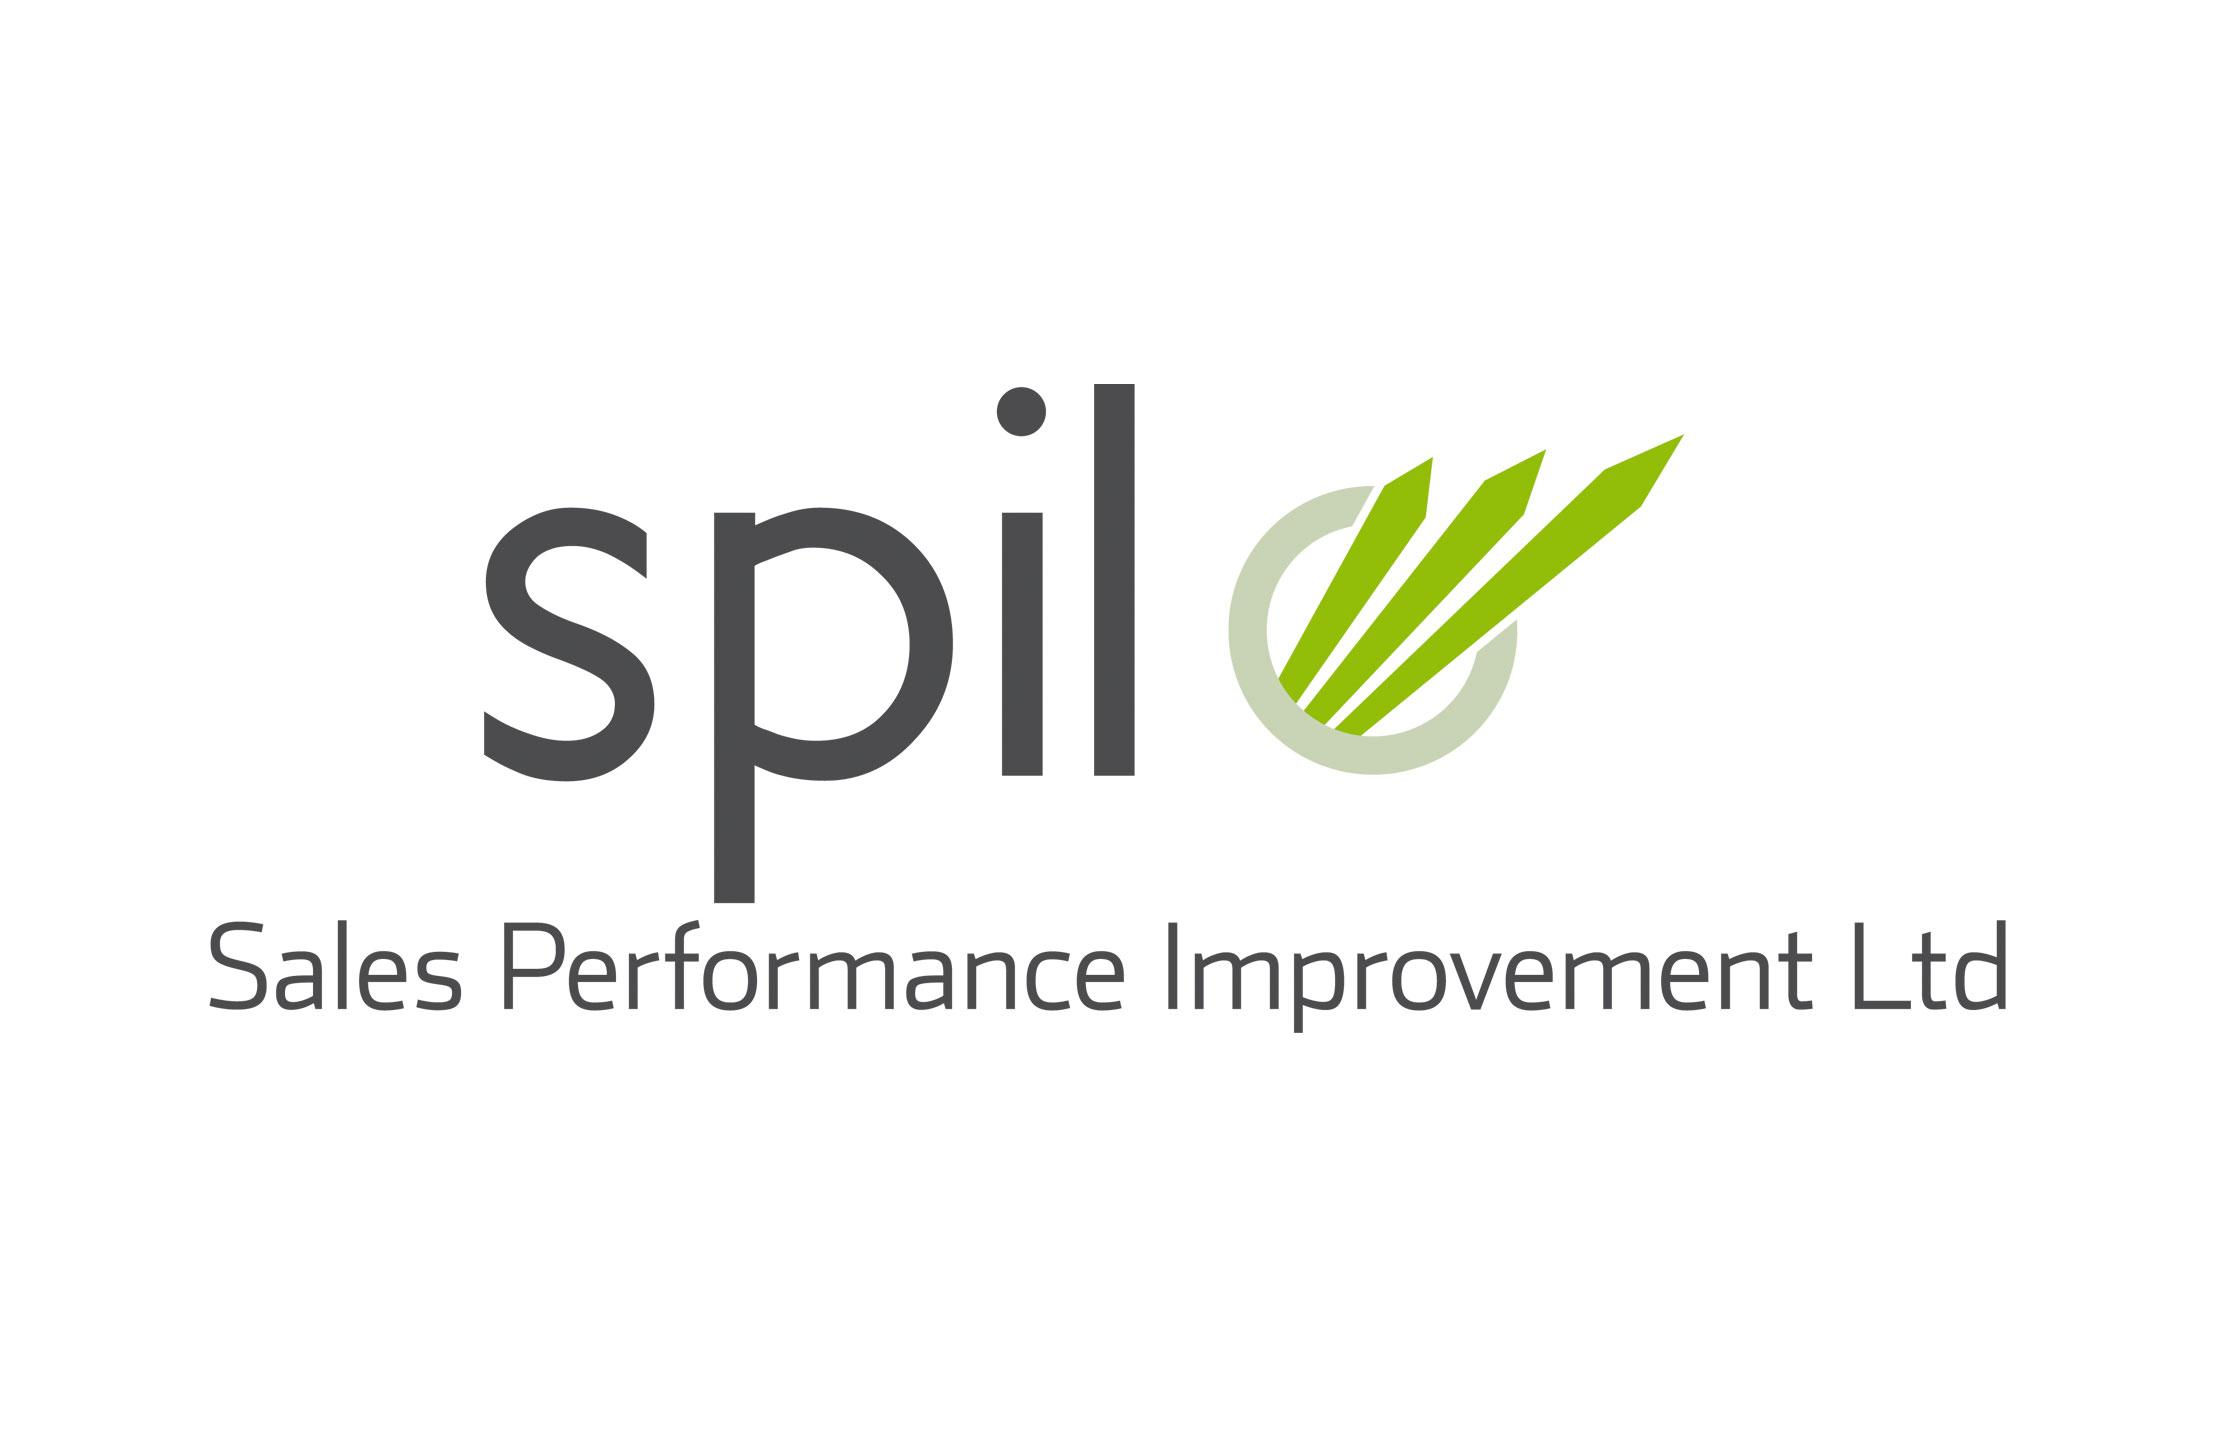 Sales Performance Improvement Limited Logo